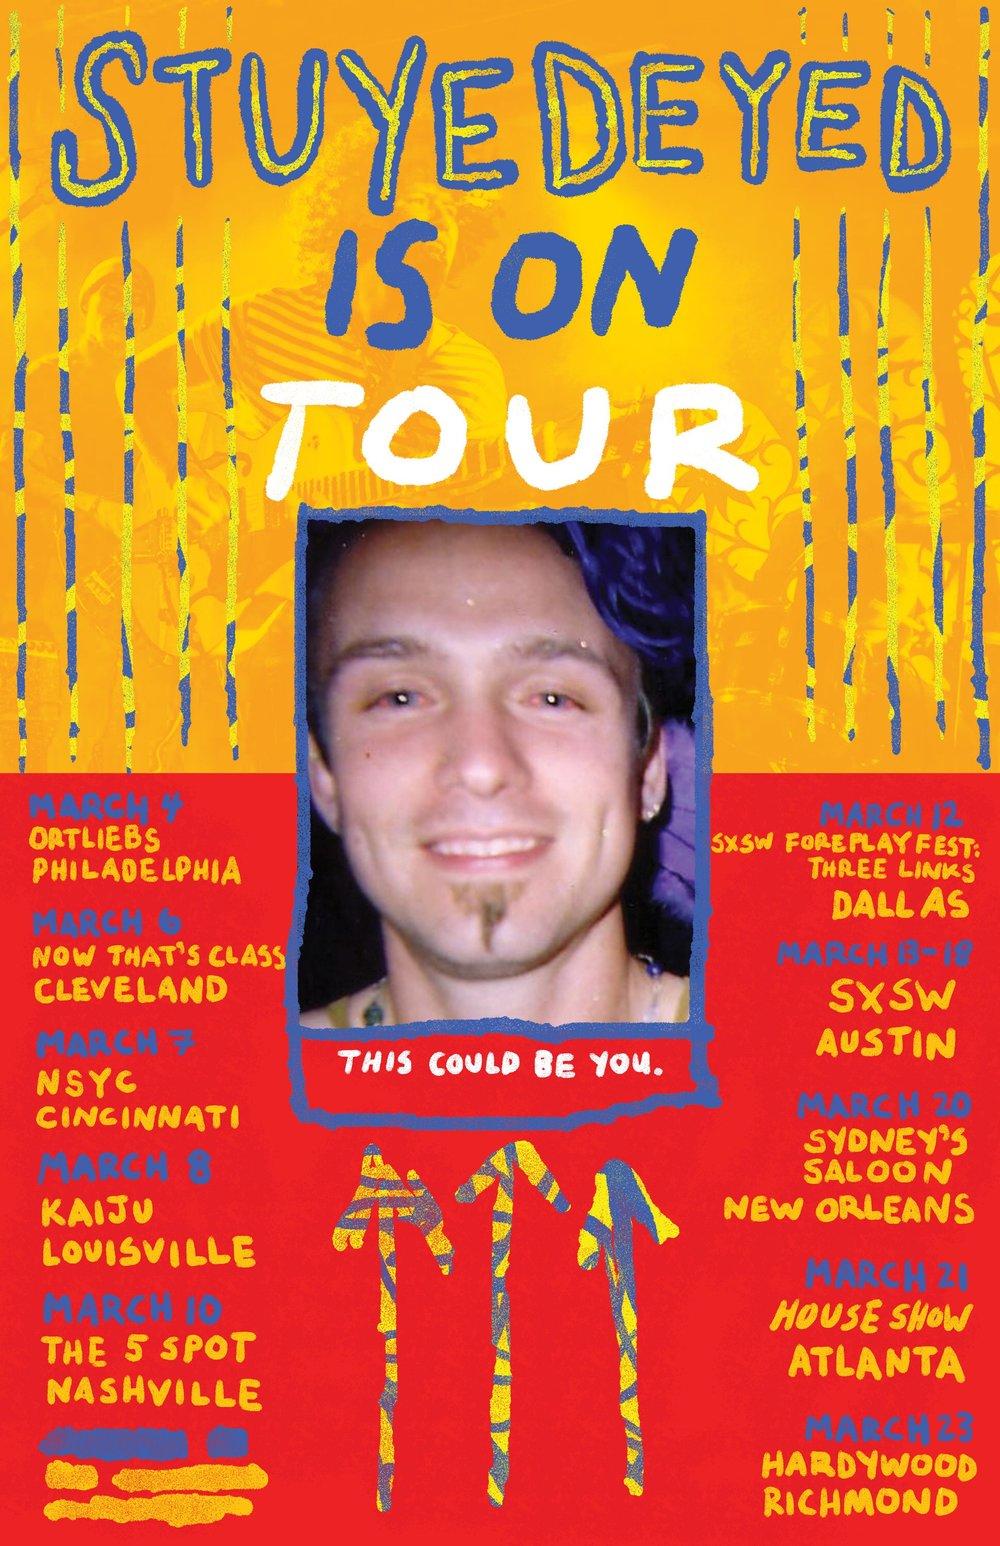 Stuyedeyed_Tour.jpg